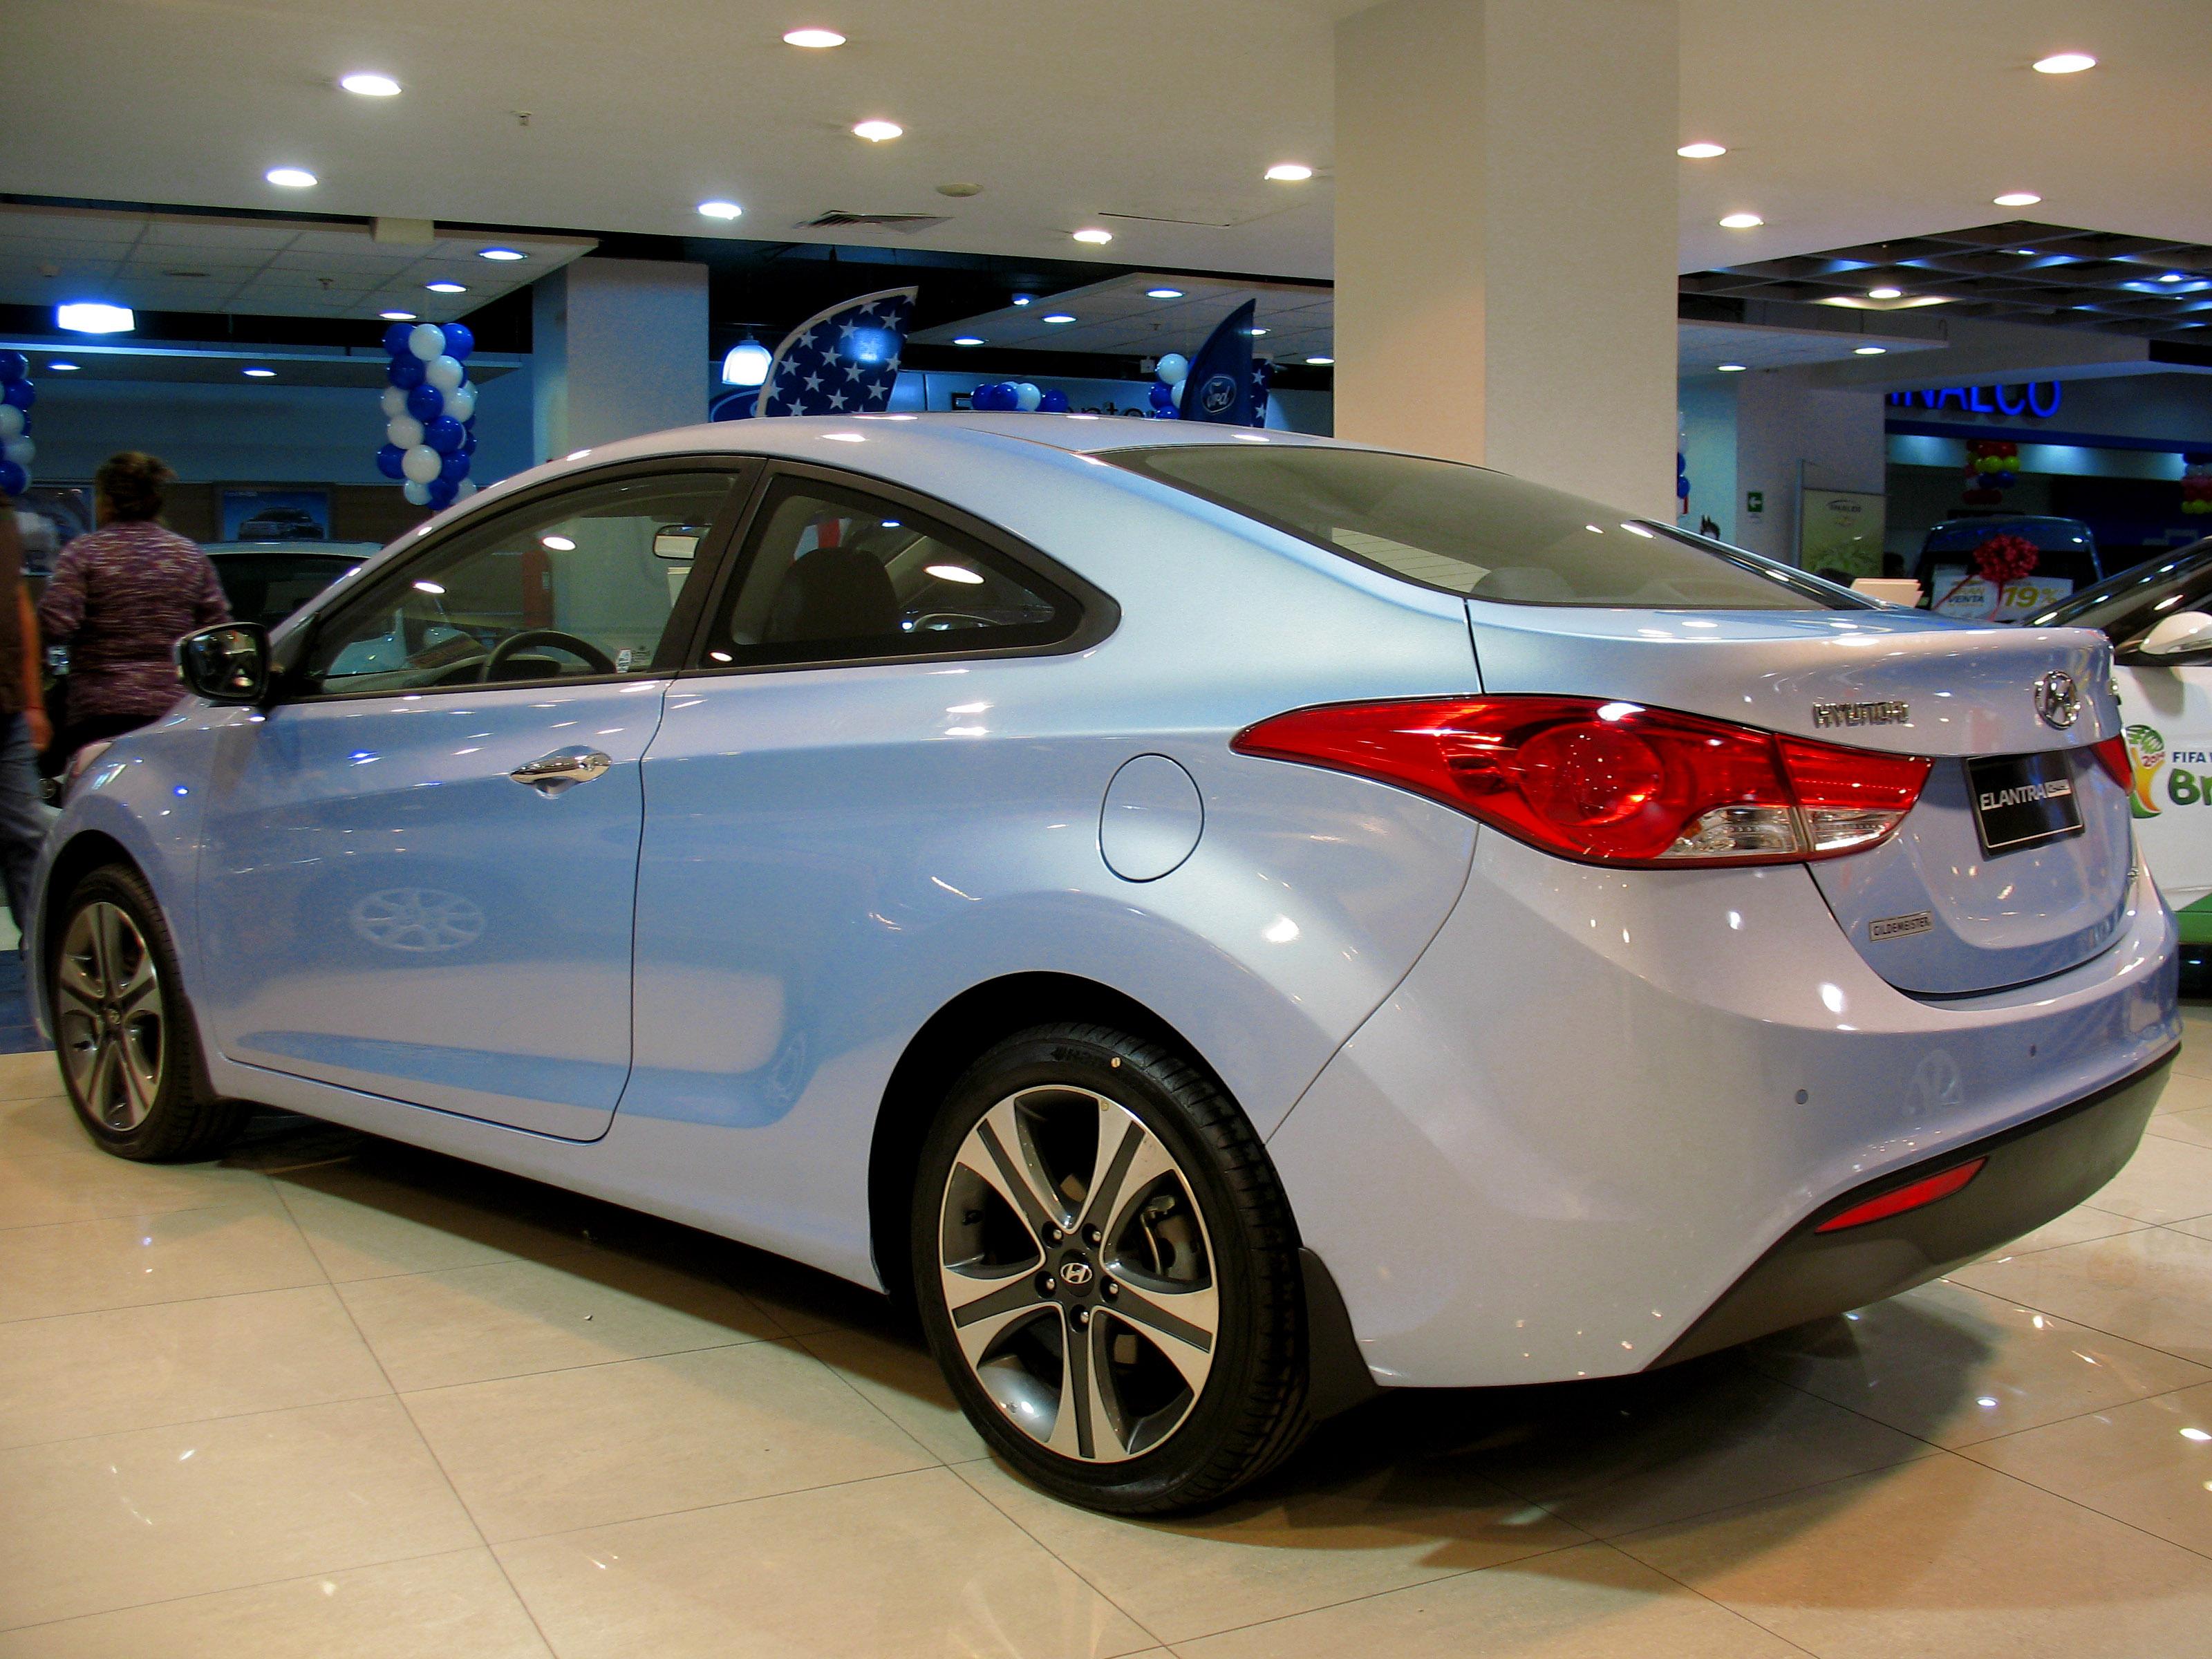 Beautiful File:Hyundai Elantra Coupe 1.8 GLS 2014 (14392706752)